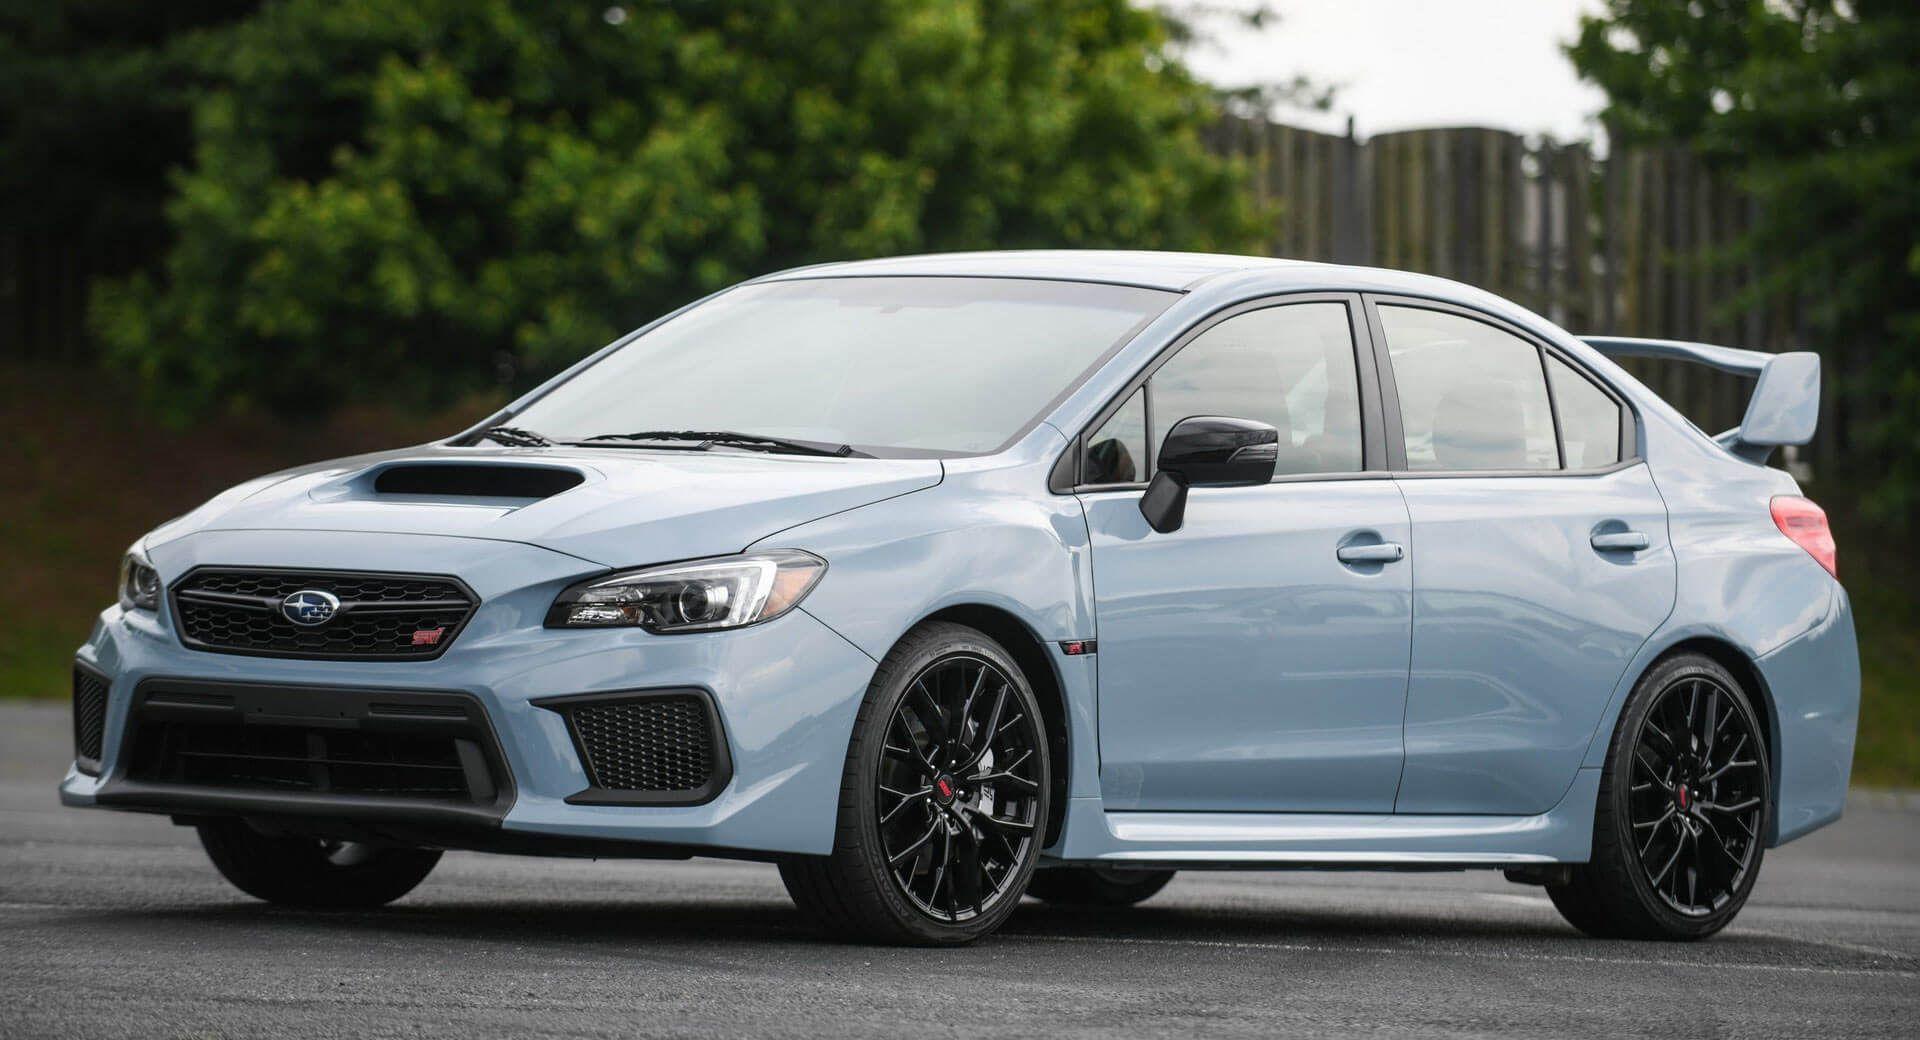 Subaru Unveils Limited Edition 2019 WRX And WRX STI Series